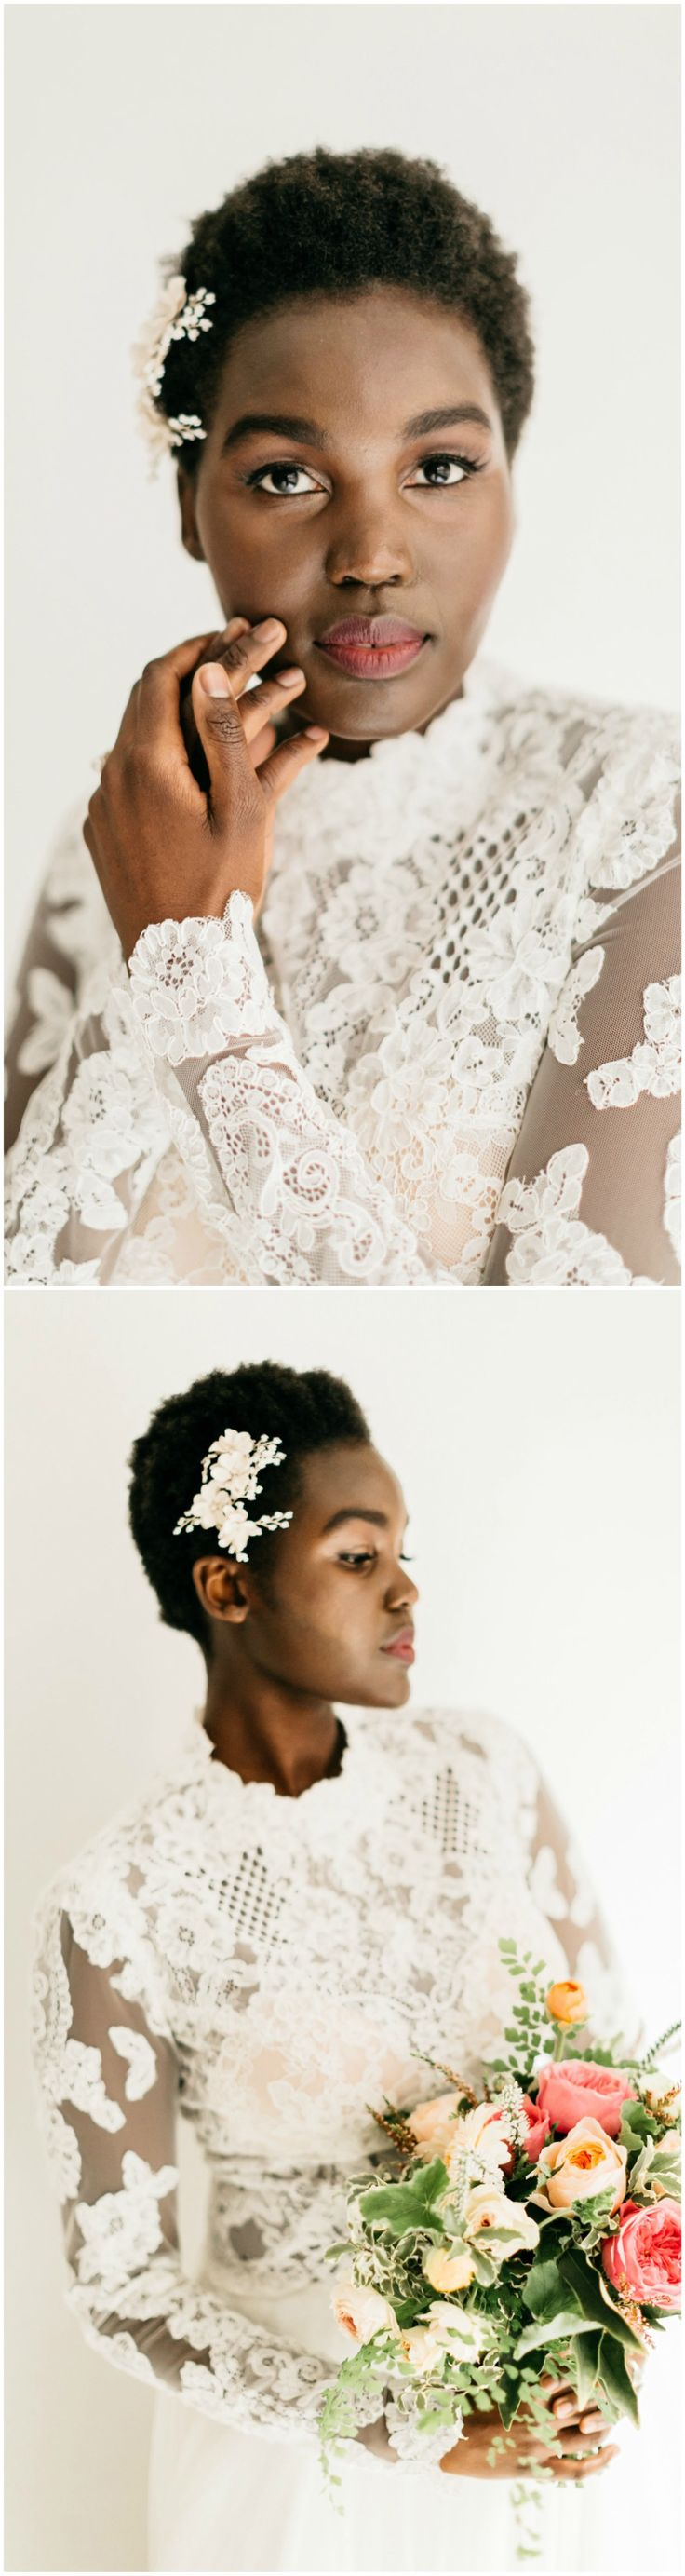 793 best Wedding Hairstyles images on Pinterest   Wedding hair ...